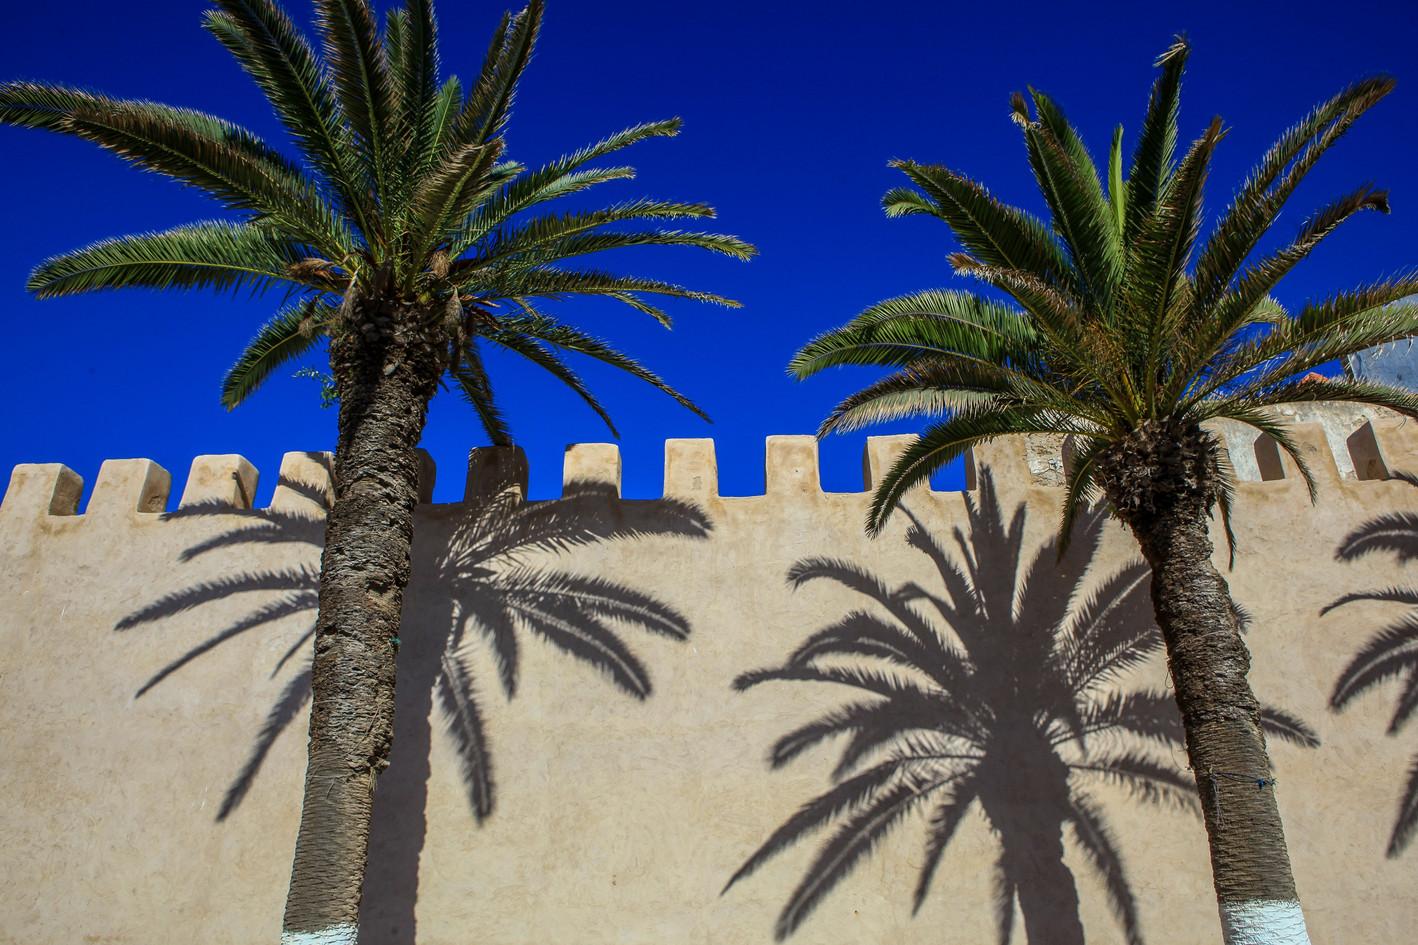 1343898 palm.jpg